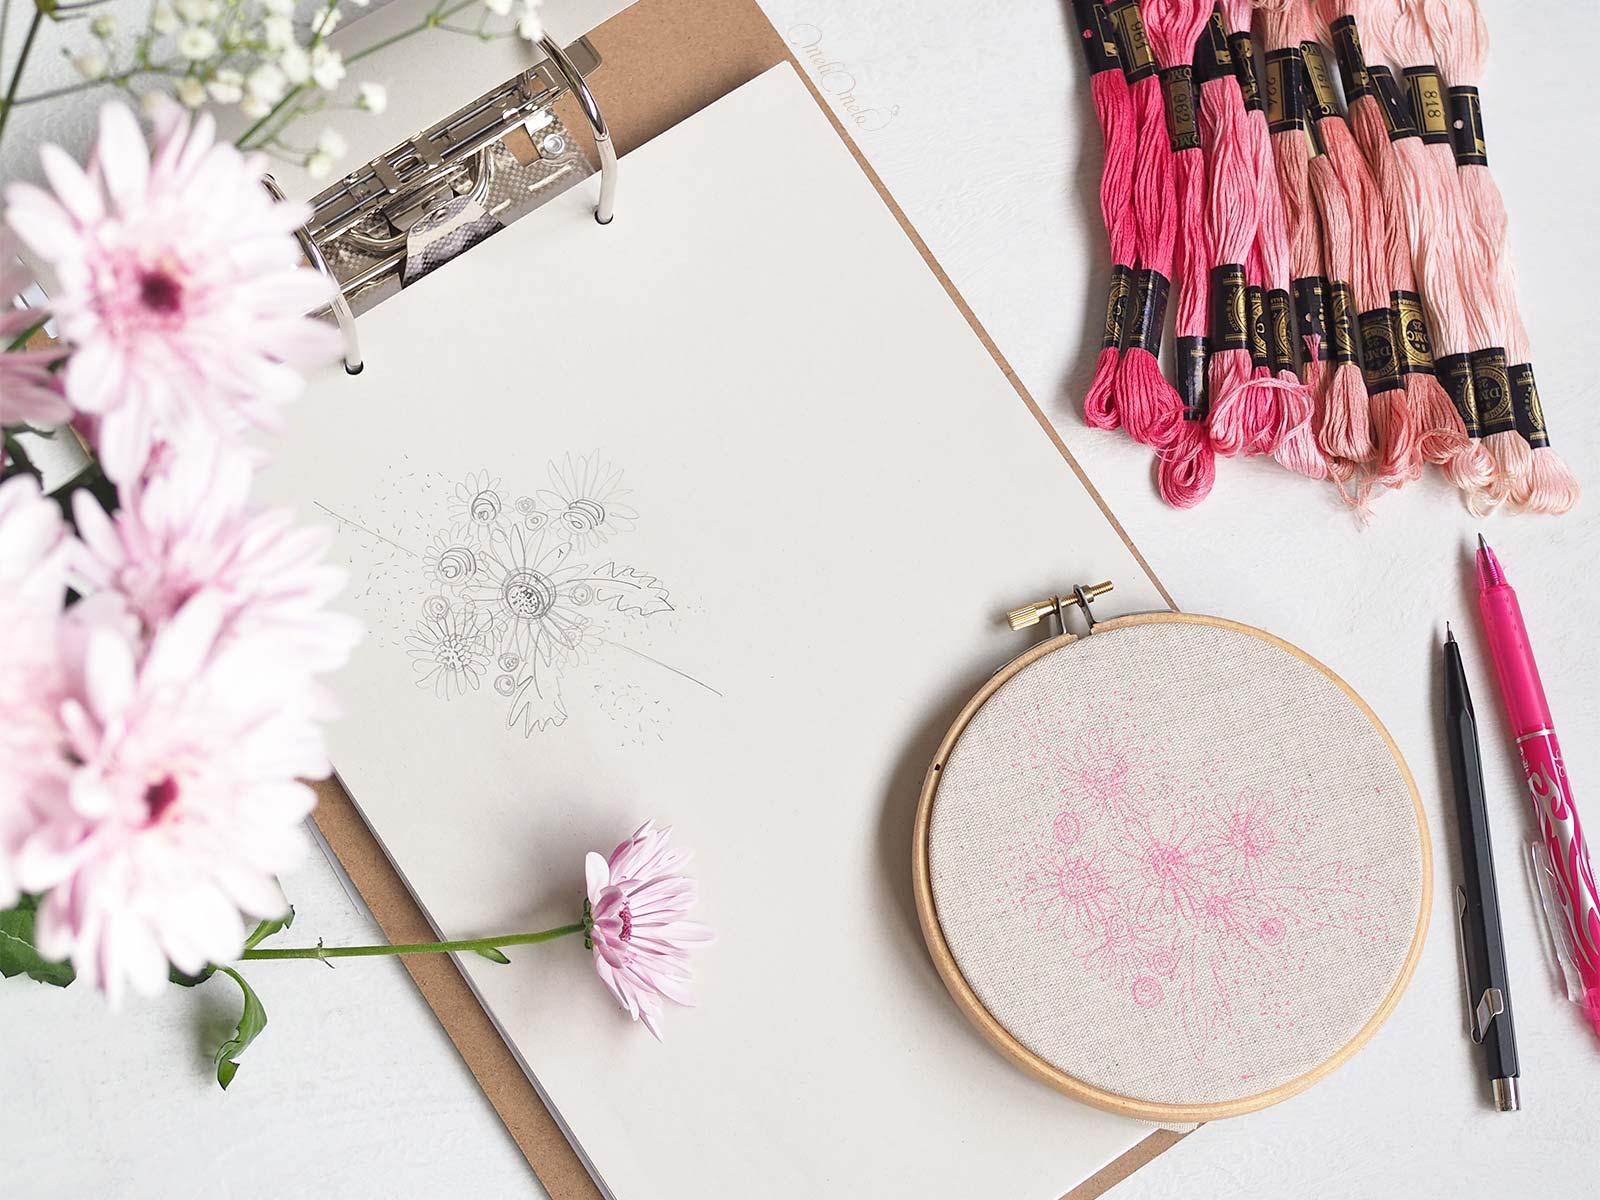 broderie fleurs gerbera rose esquisse Boutique MeliMelo